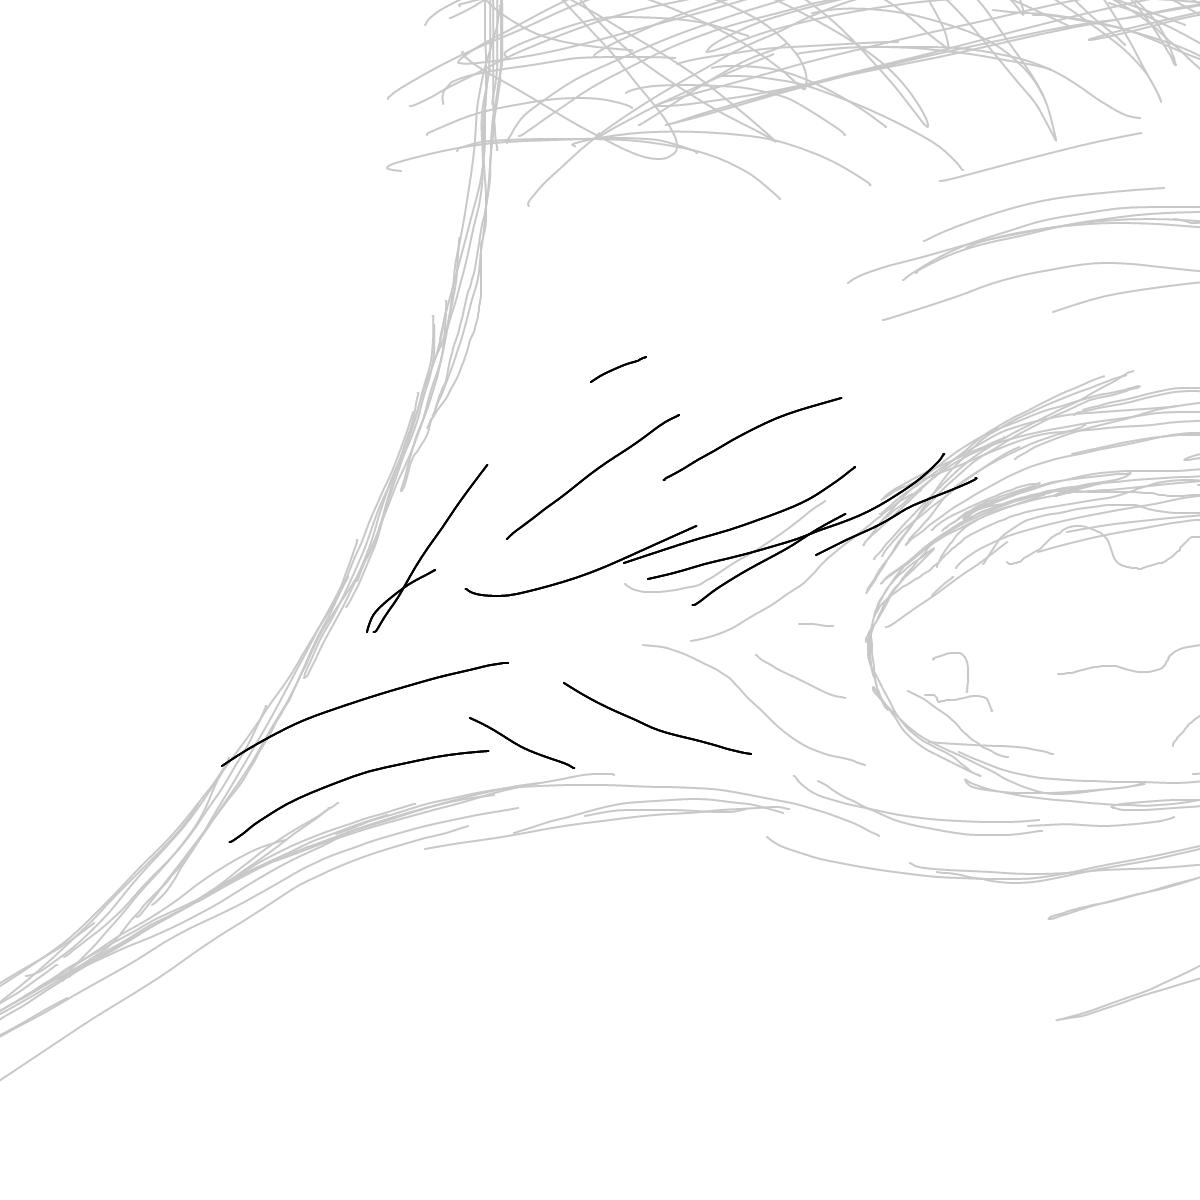 BAAAM drawing#18940 lat:-23.5476989746093750lng: -46.6355361938476560